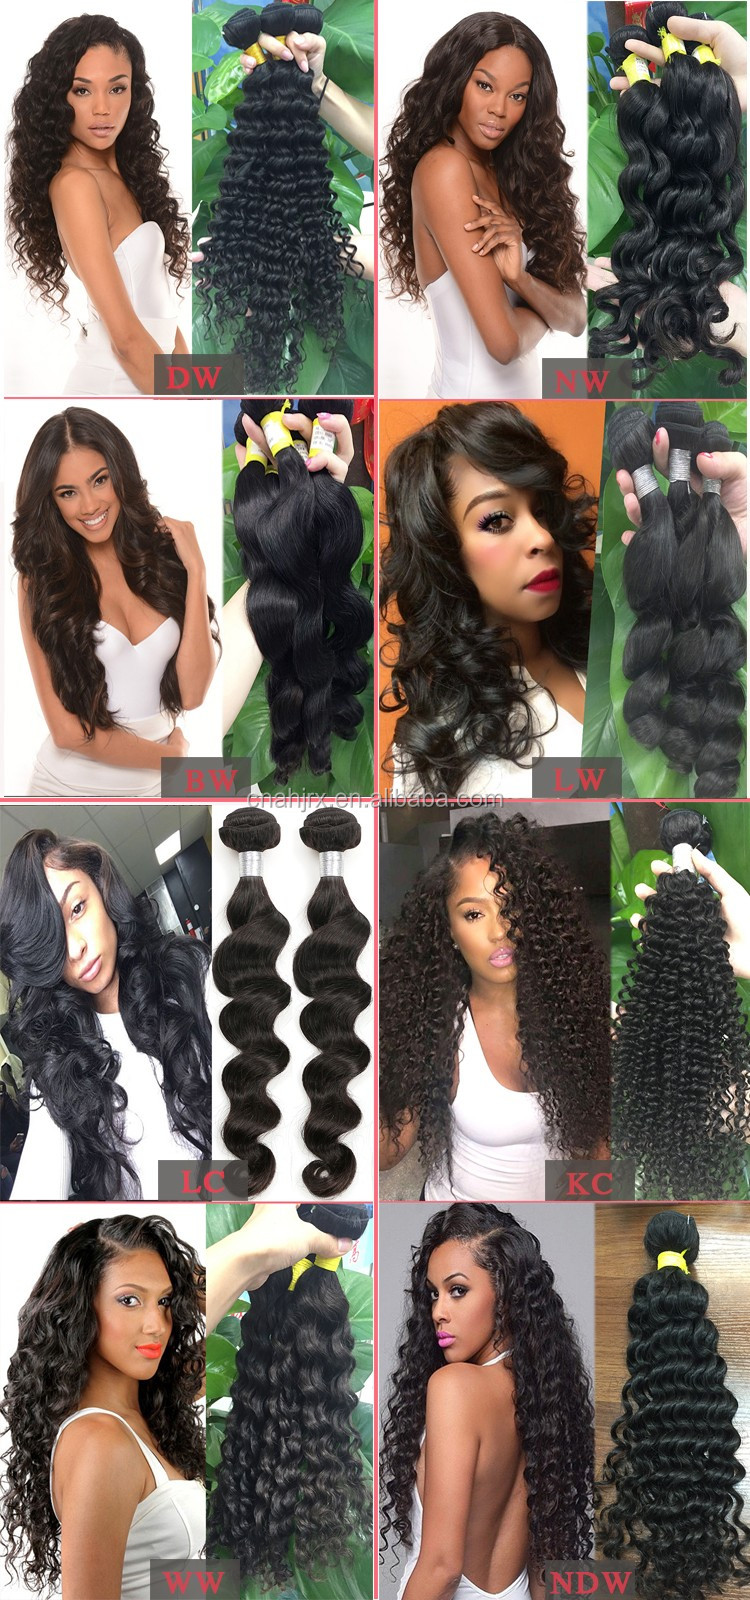 Brazilian Hair Human Hair Bulk Brazilian Deep Curly Ombre Hair Weave